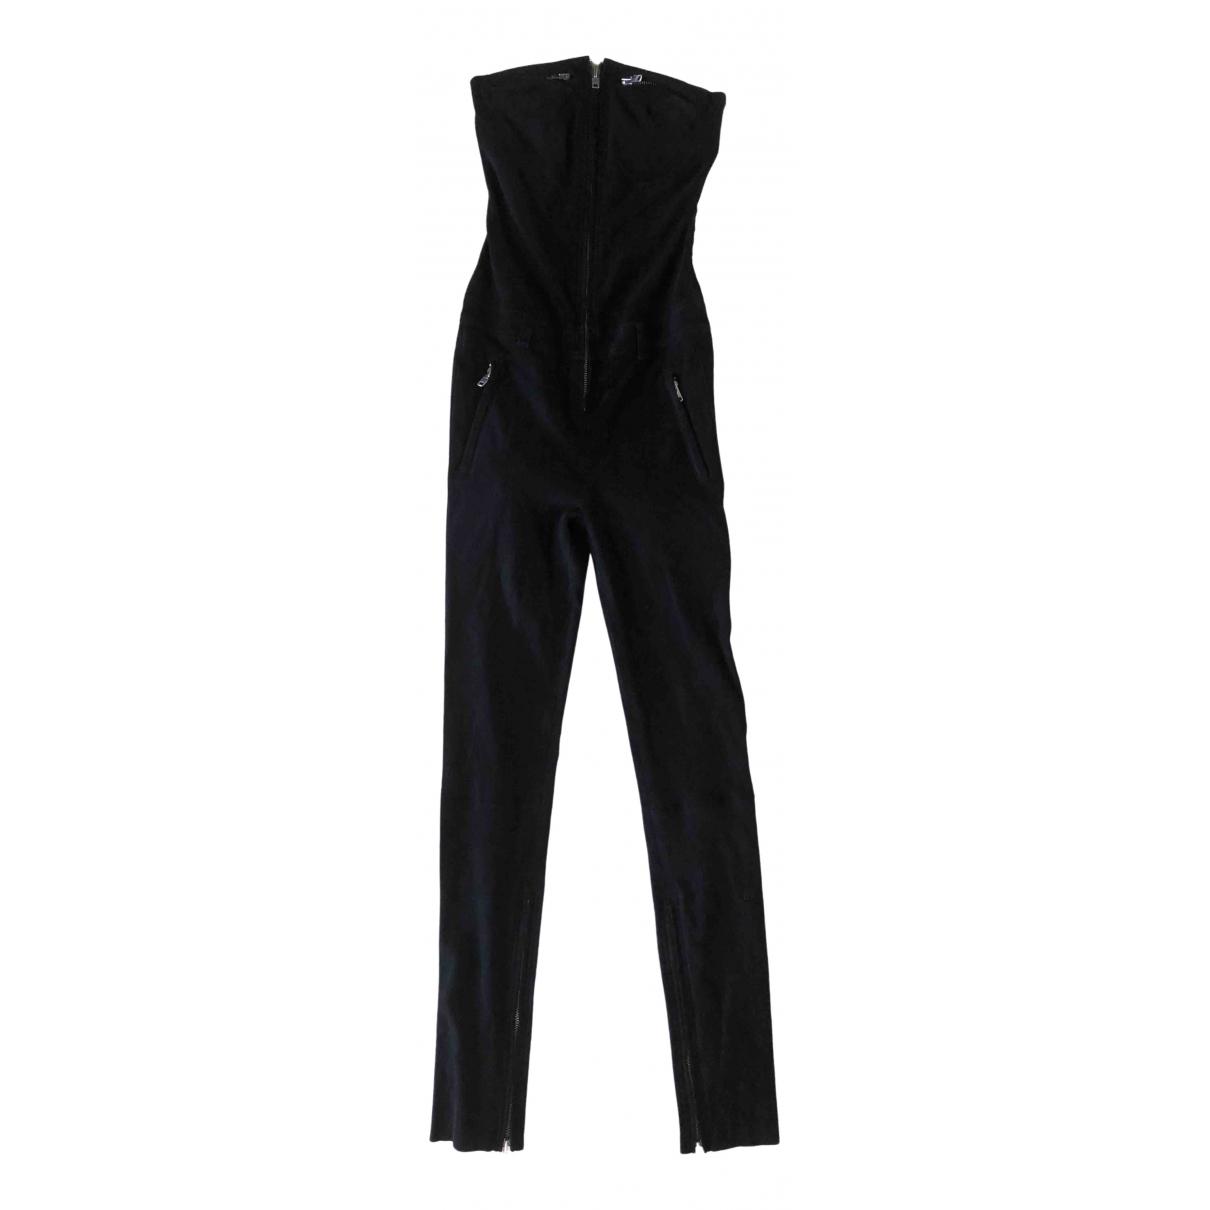 Haider Ackermann \N Black Suede jumpsuit for Women 36 FR